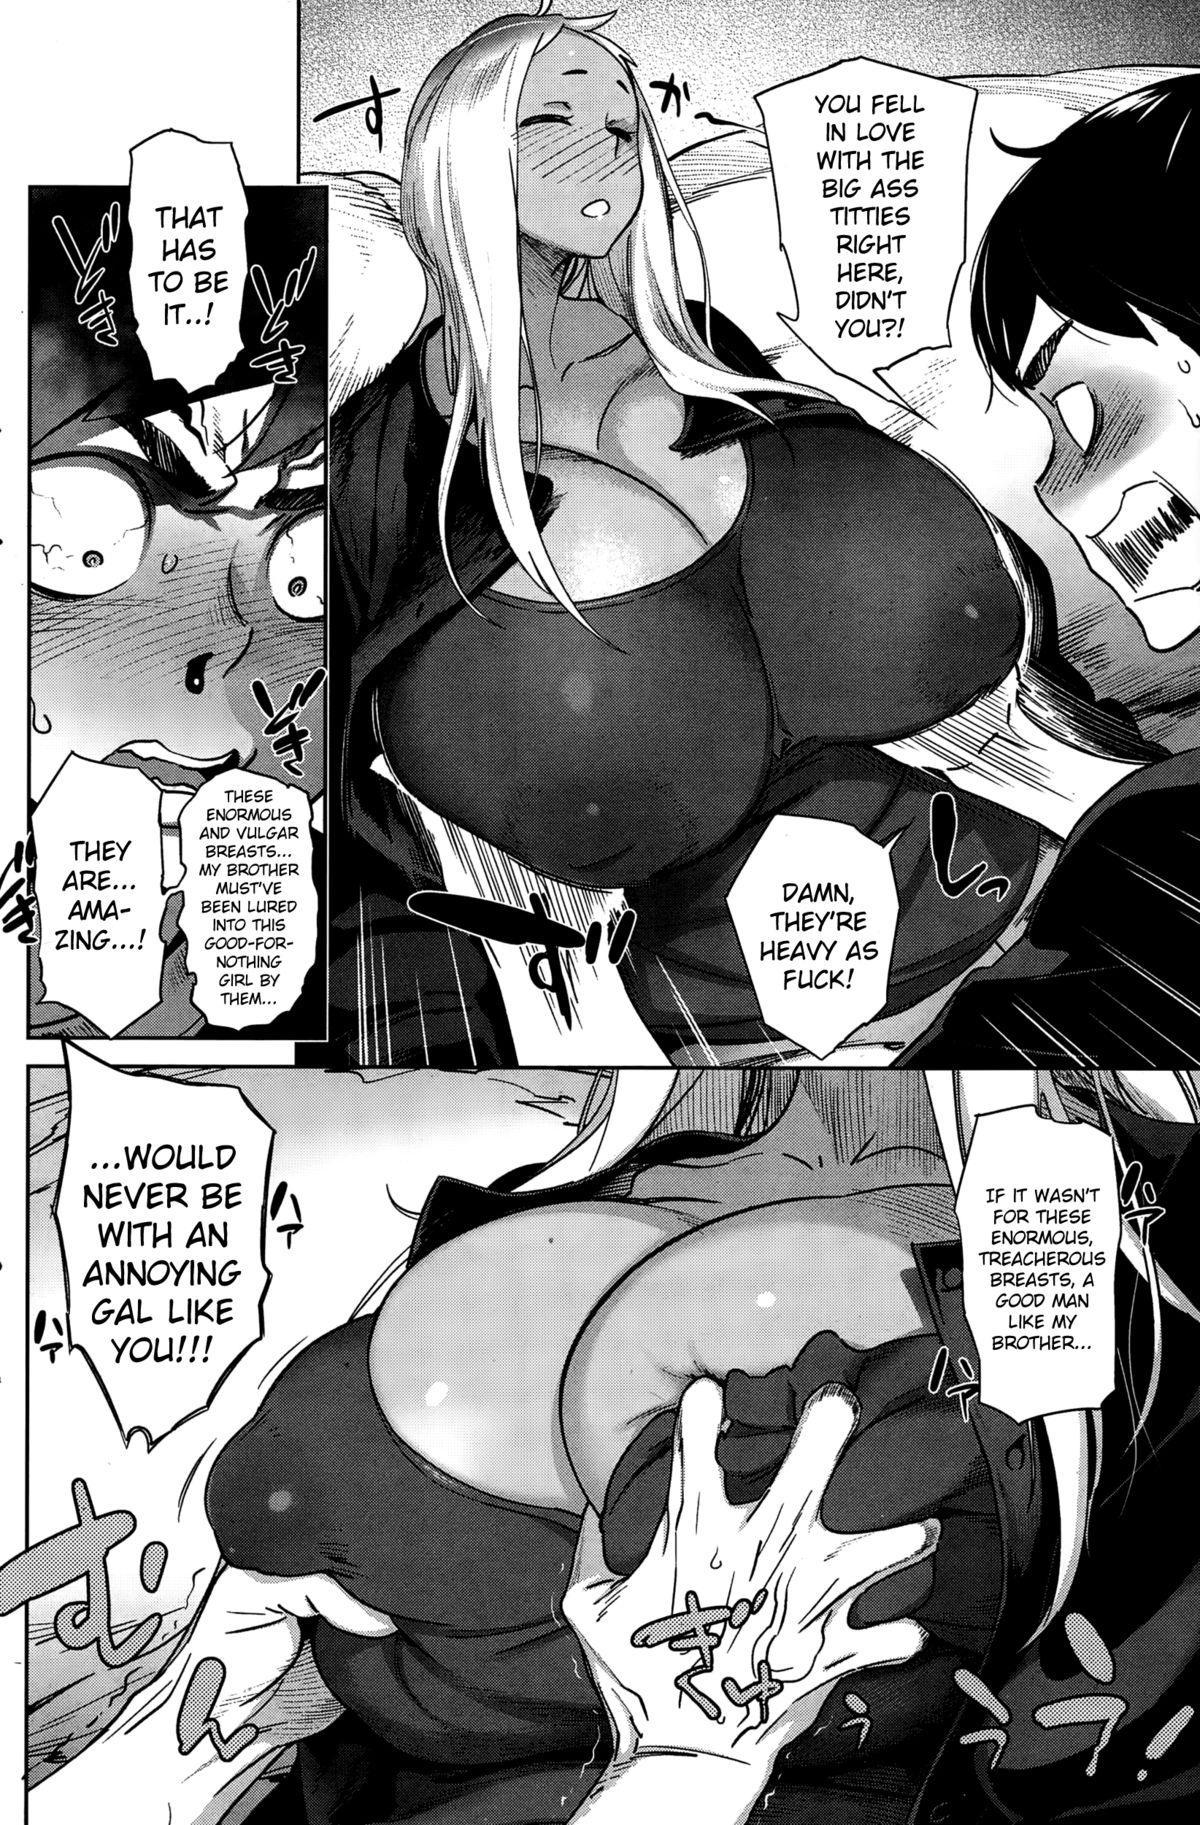 [Bobobo] Aniyome Milk | Elder Sister-in-Law's Milk! (COMIC Shitsurakuten 2014-12) [English] [Steven_Even] 3